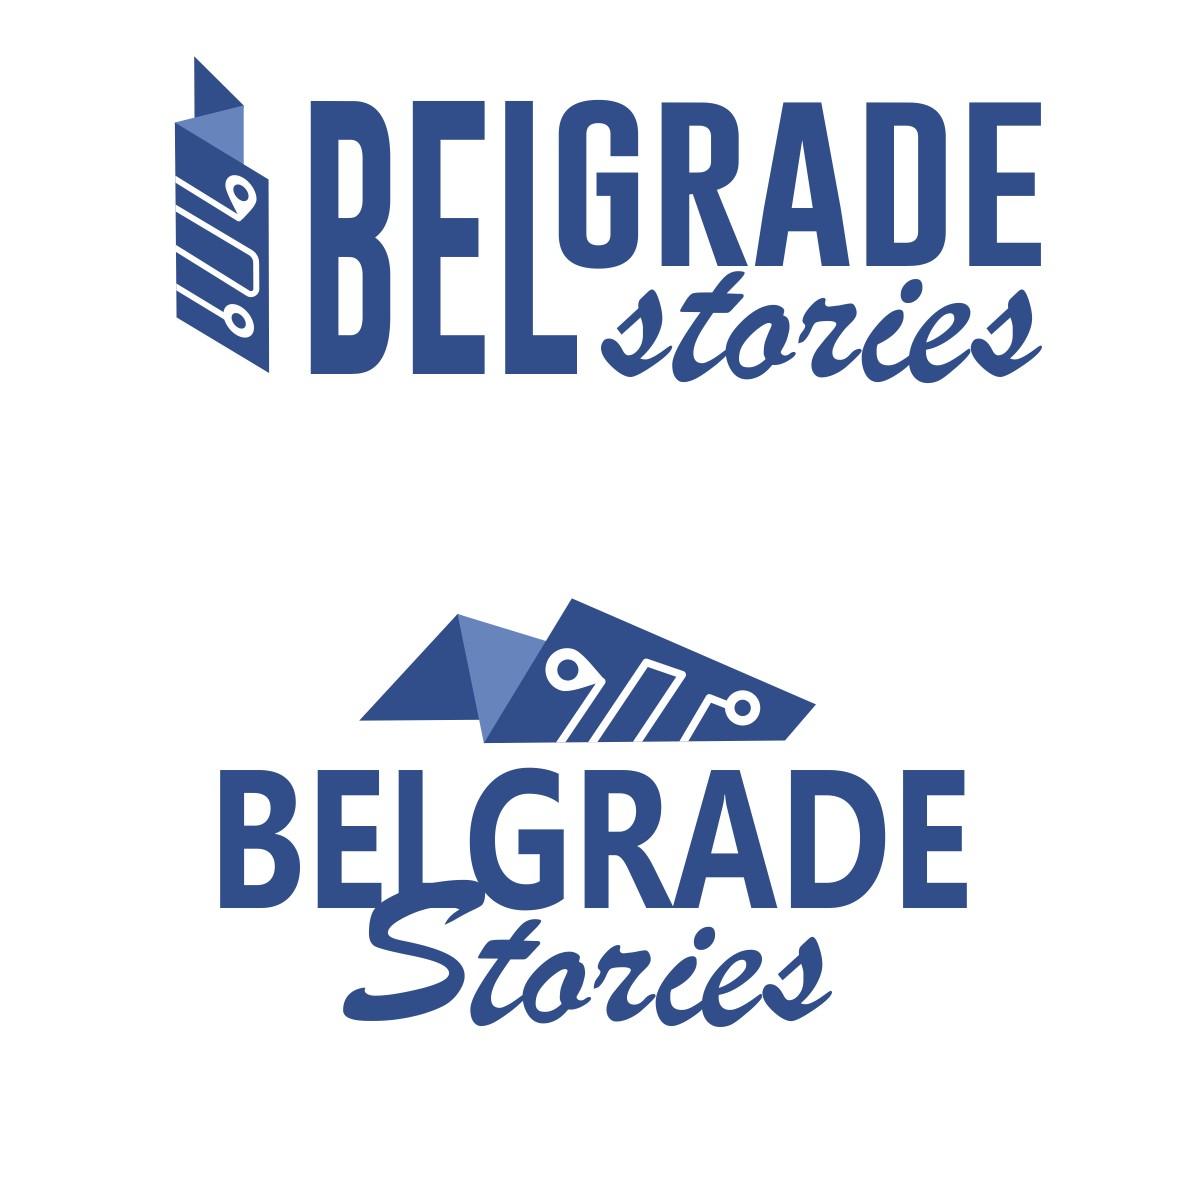 Логотип для агентства городских туров в Белграде фото f_8605892061a27bc1.jpg